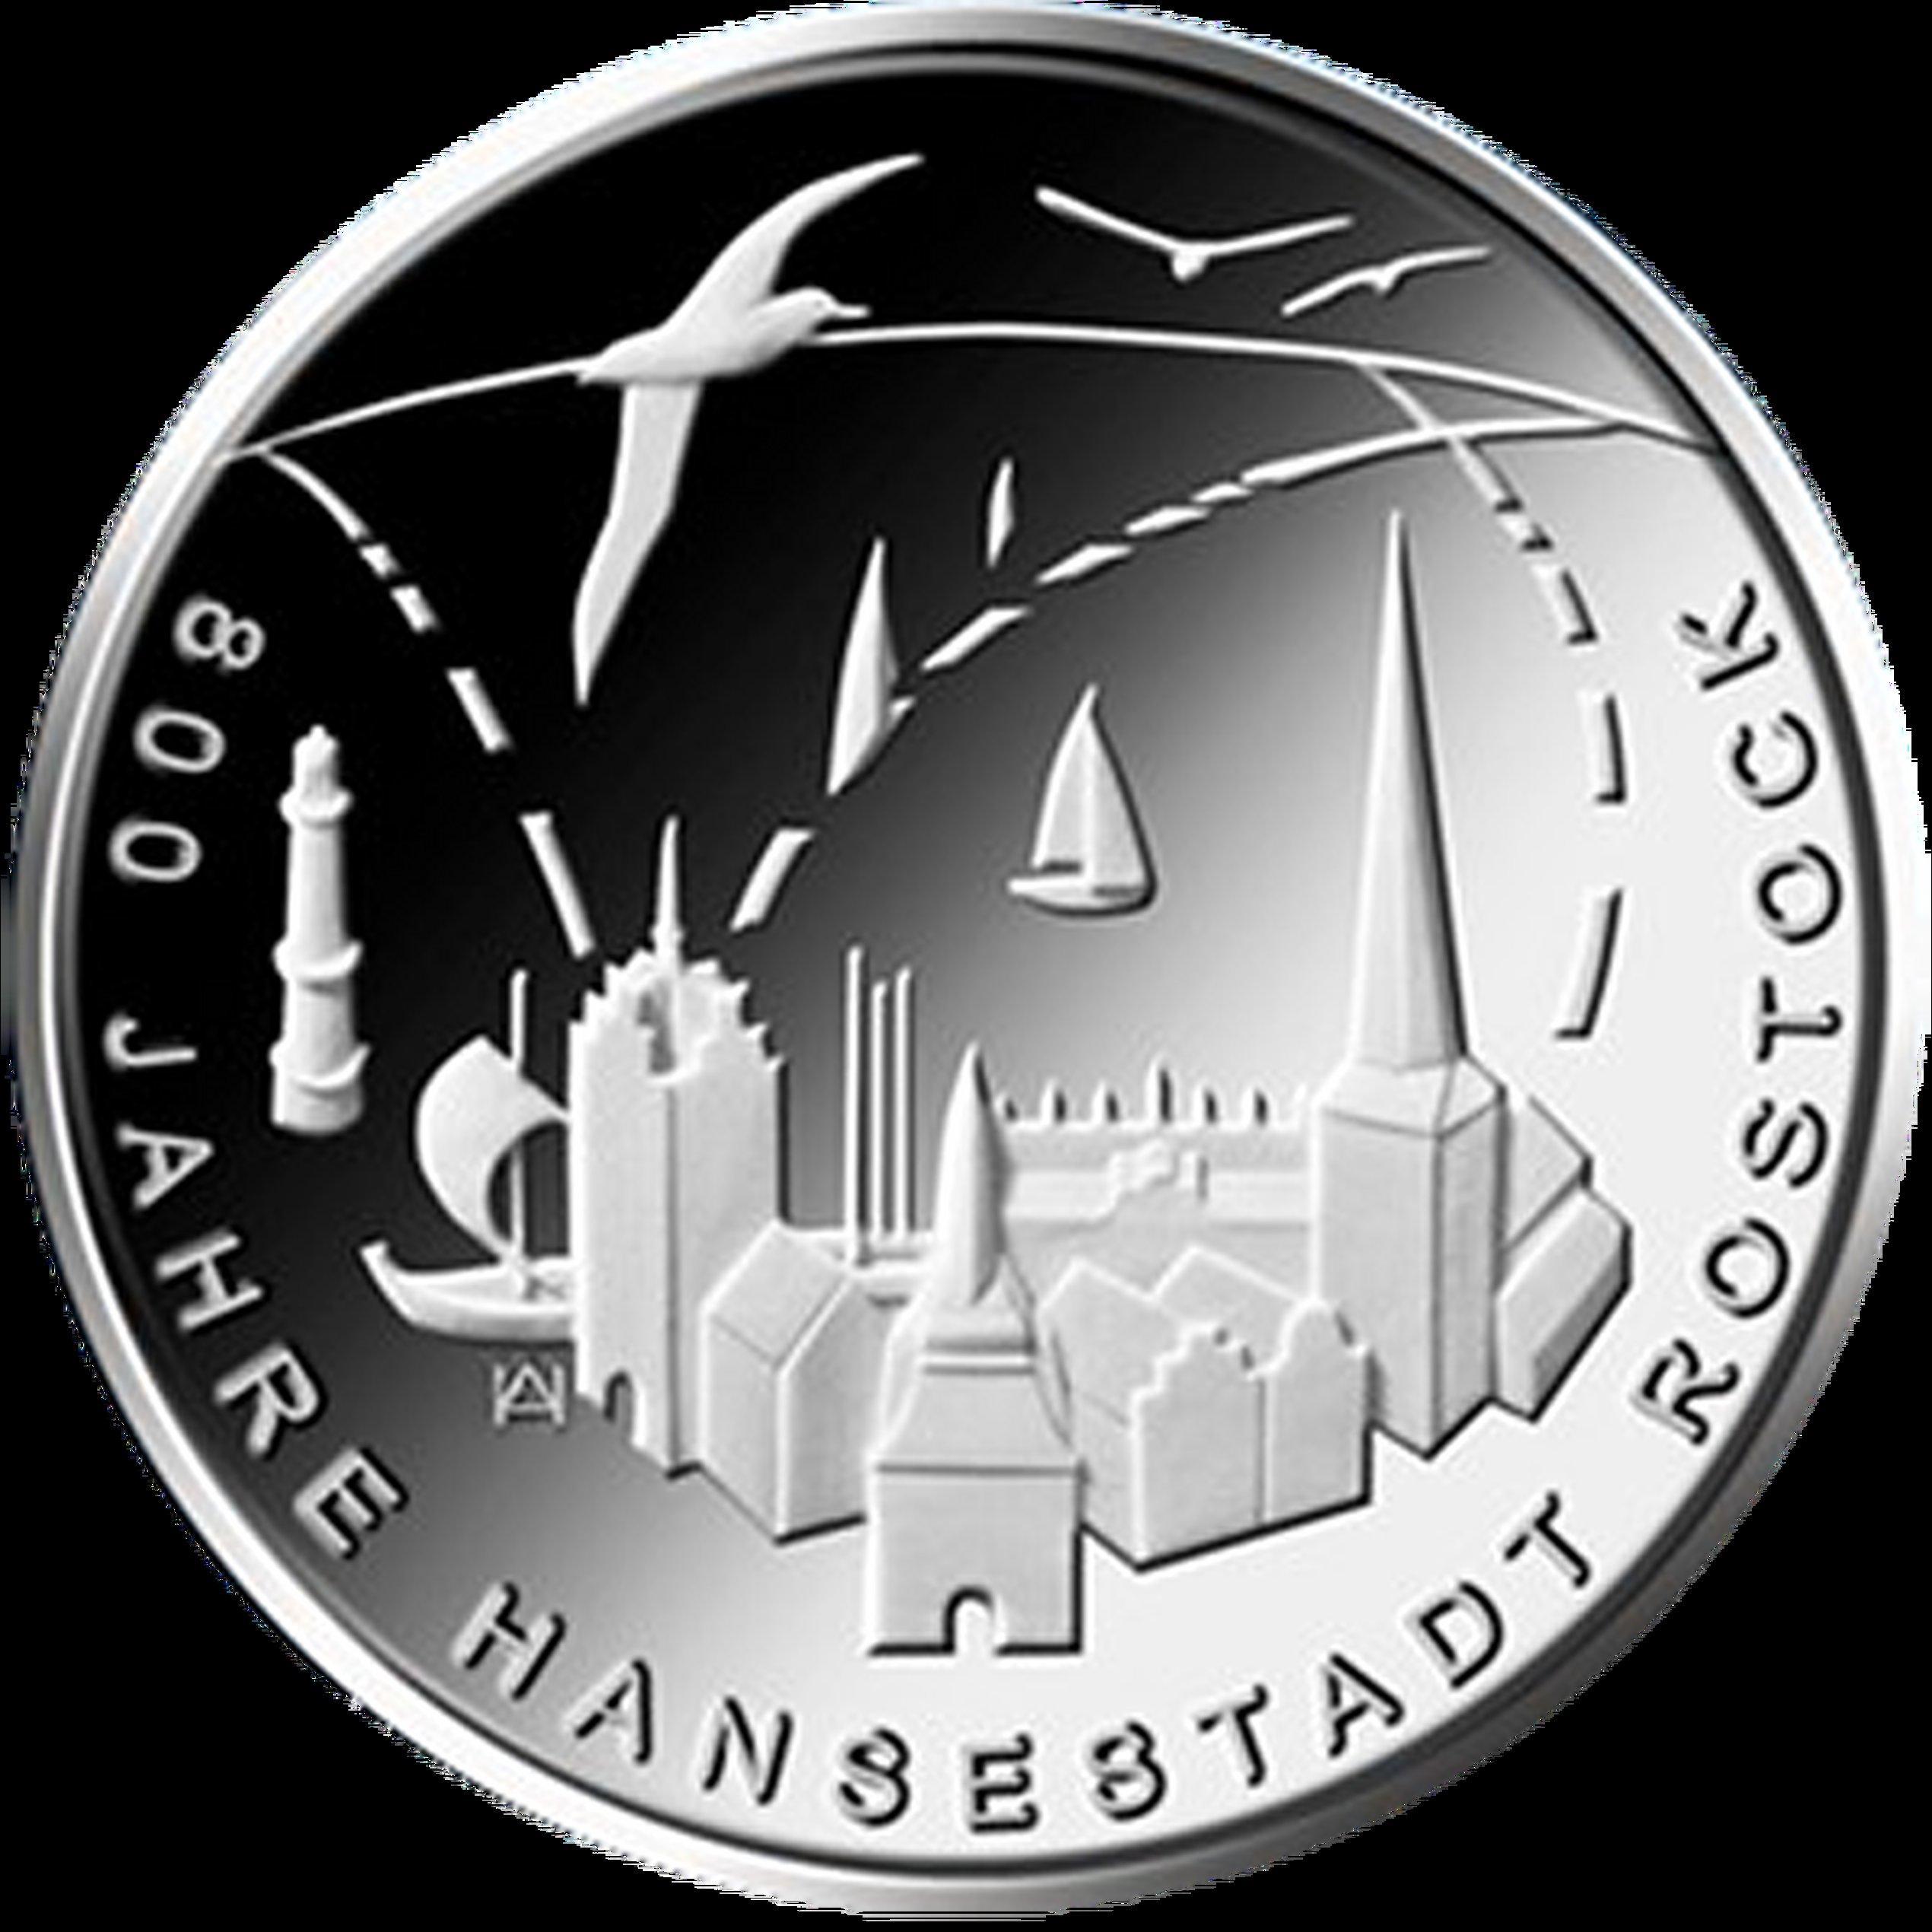 20 Euro Silber Münze Brd 2018 800 Jahre Hansestadt Rostock Pp